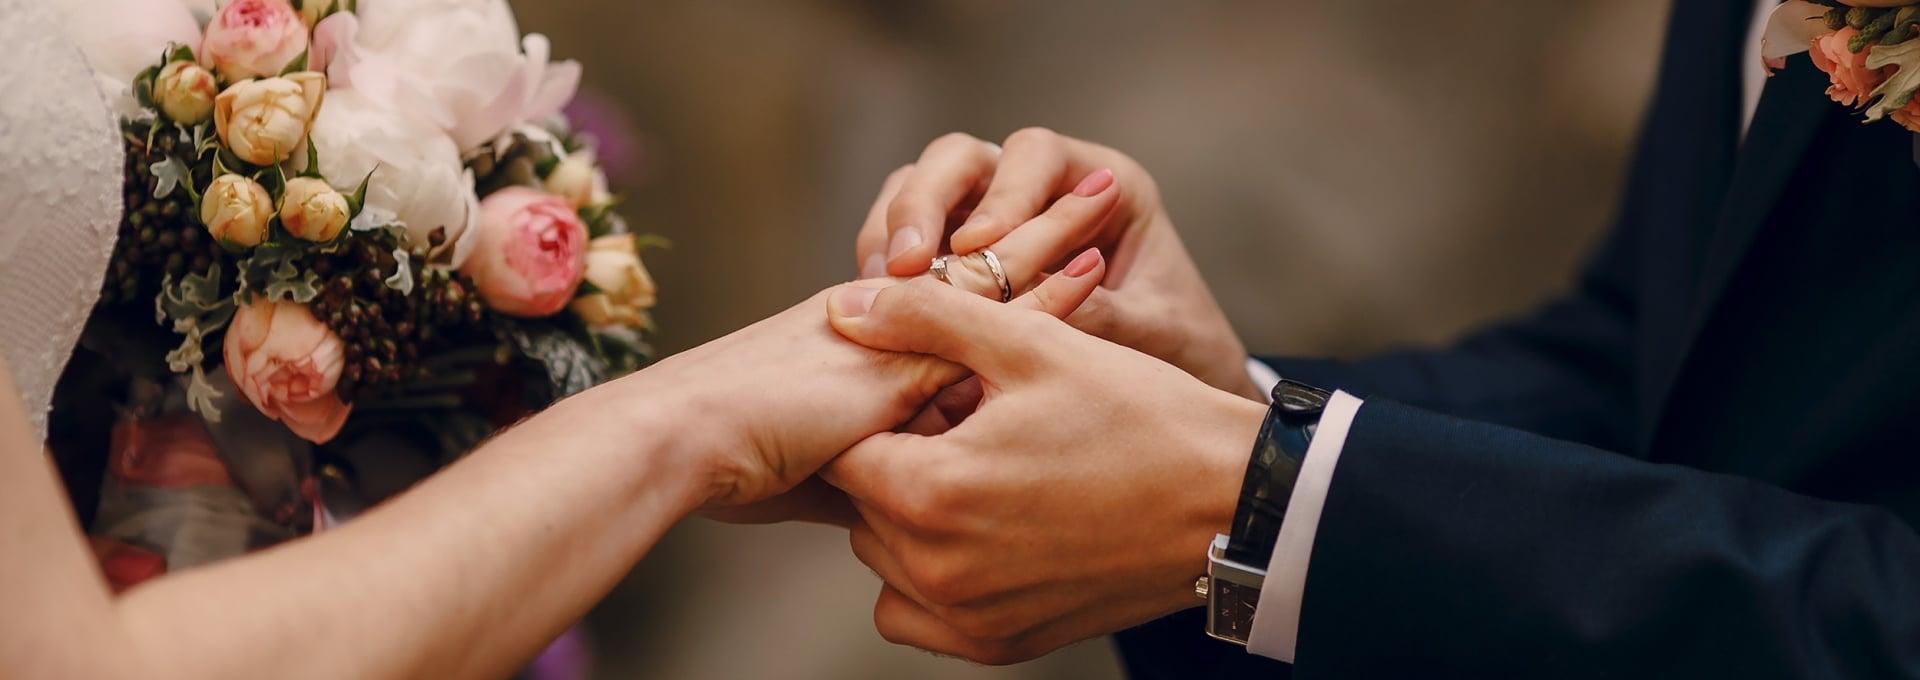 El Matrimonio Catolico Tiene Validez Legal : El matrimonio natural y el matrimonio sacramento adelante la fe